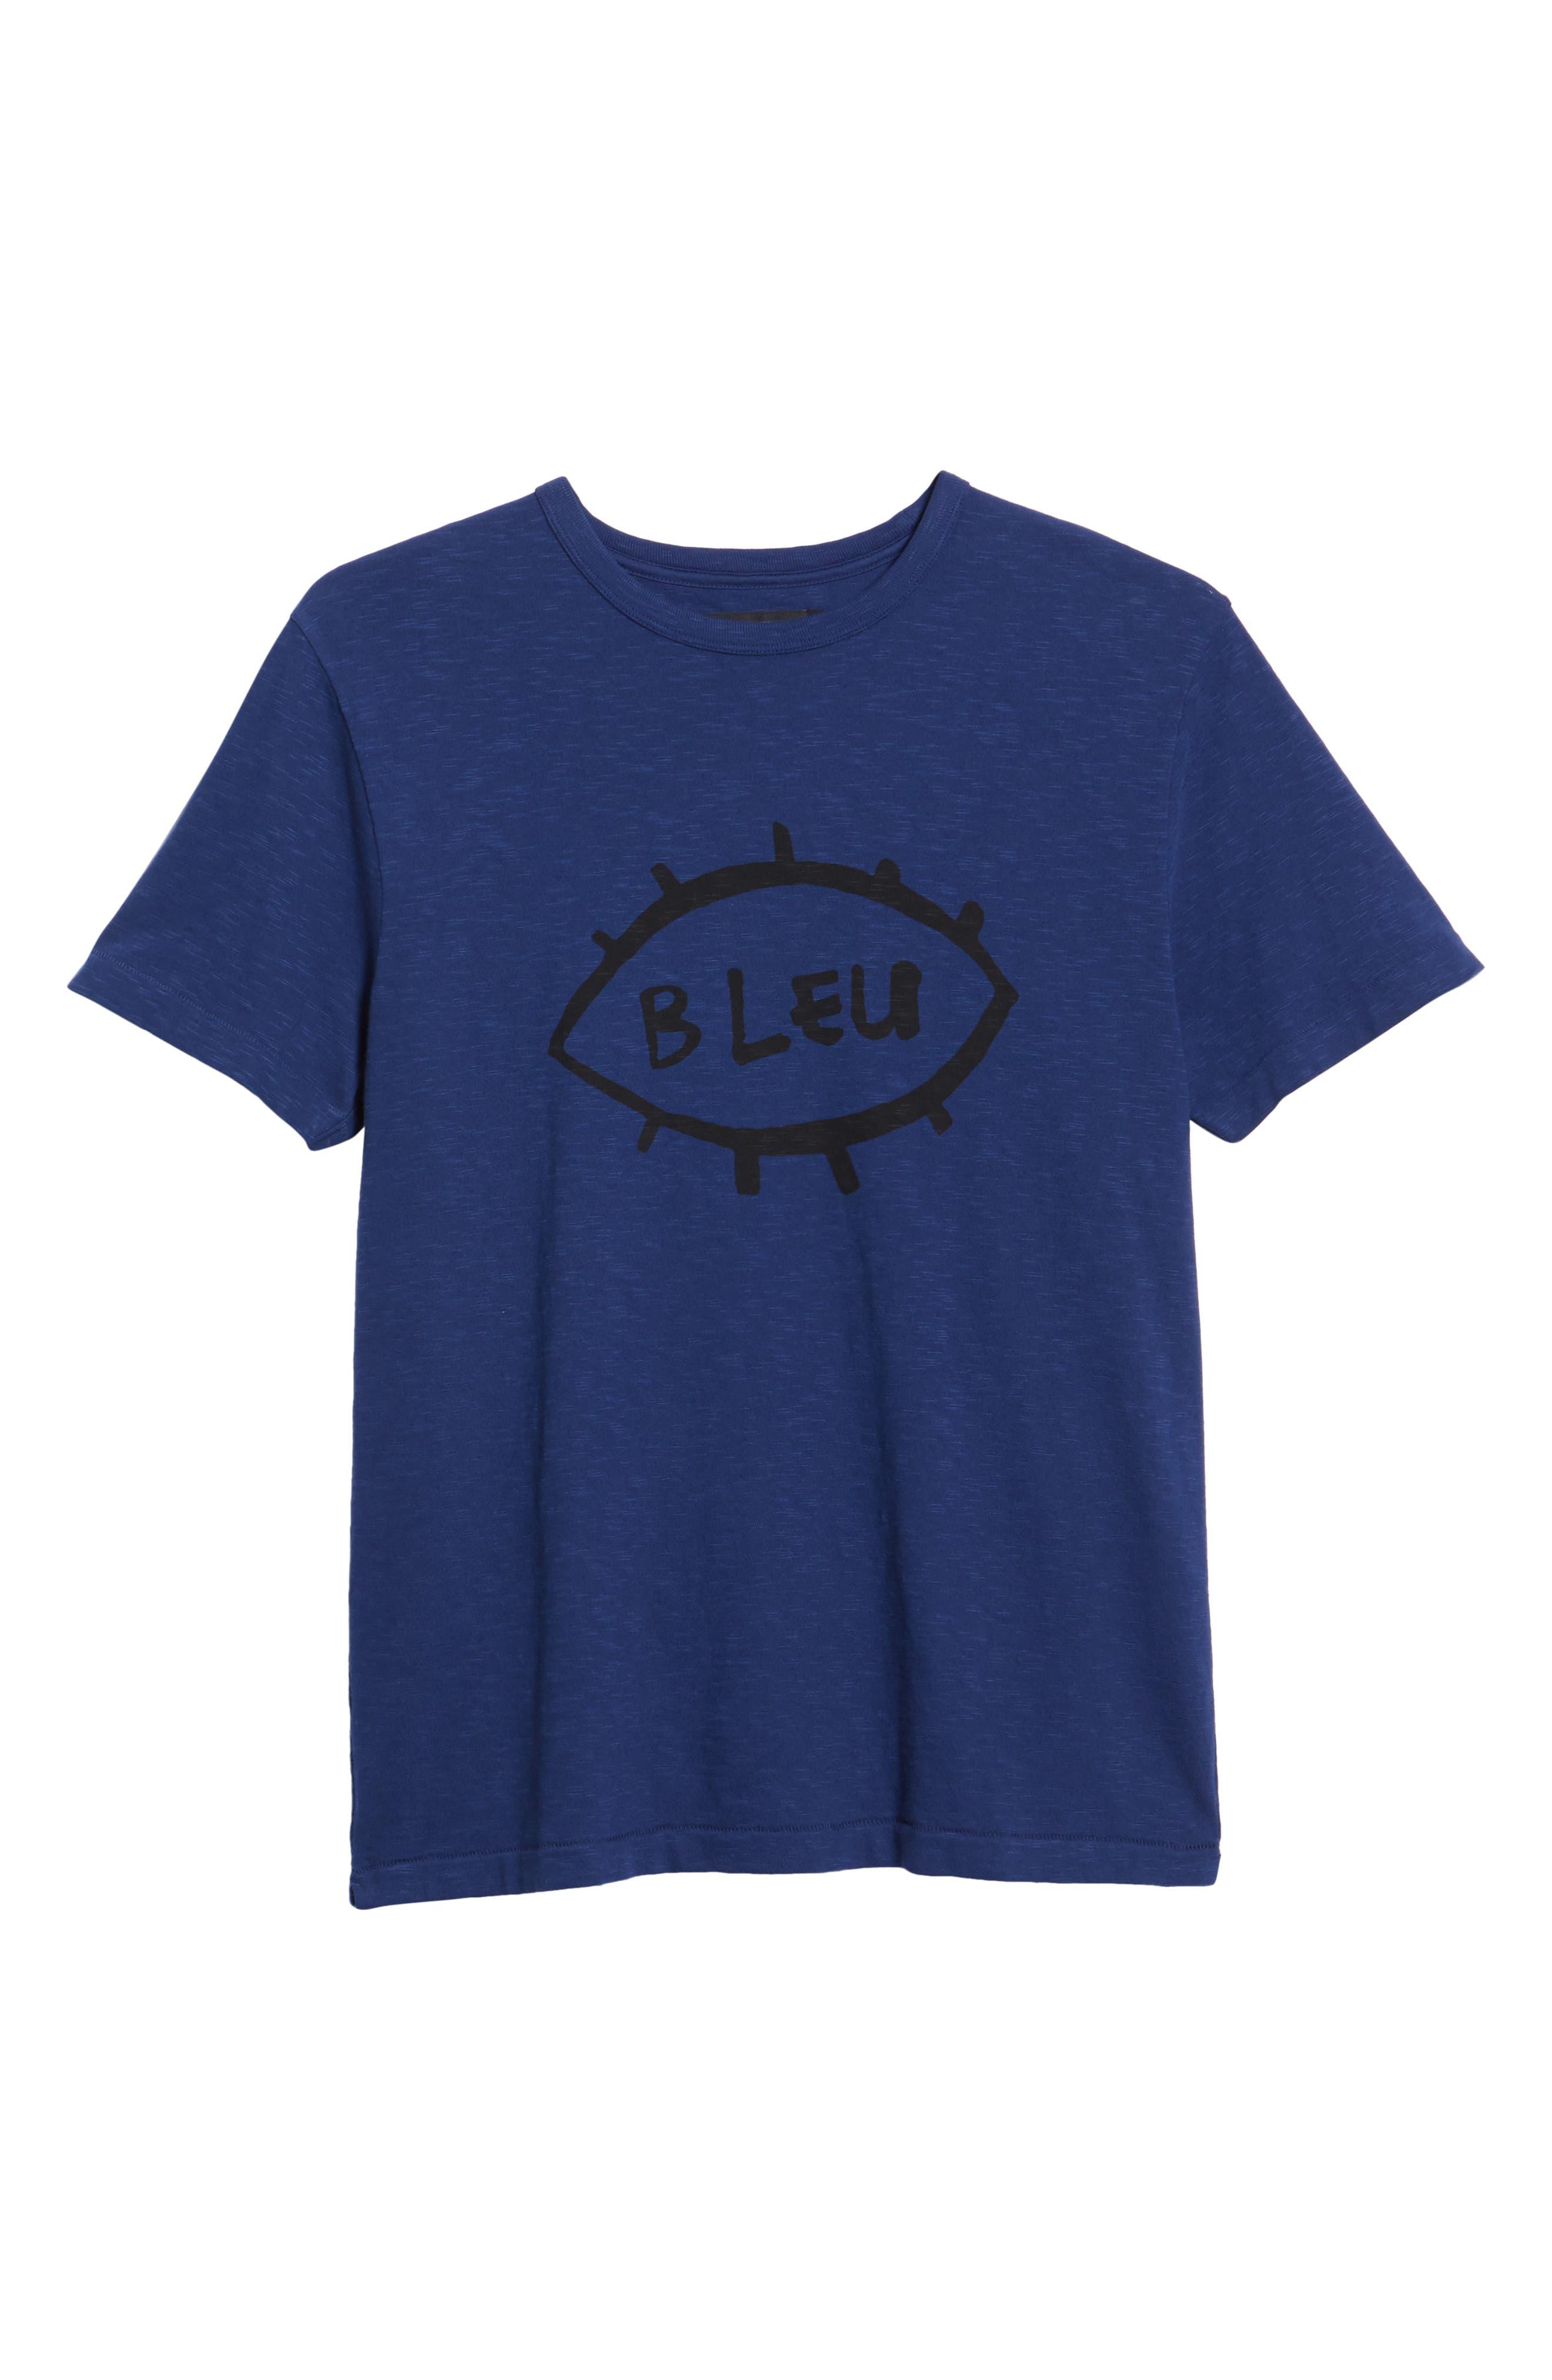 Bleu Slubbed T-Shirt,                             Alternate thumbnail 6, color,                             FATHOM BLUE BLACK